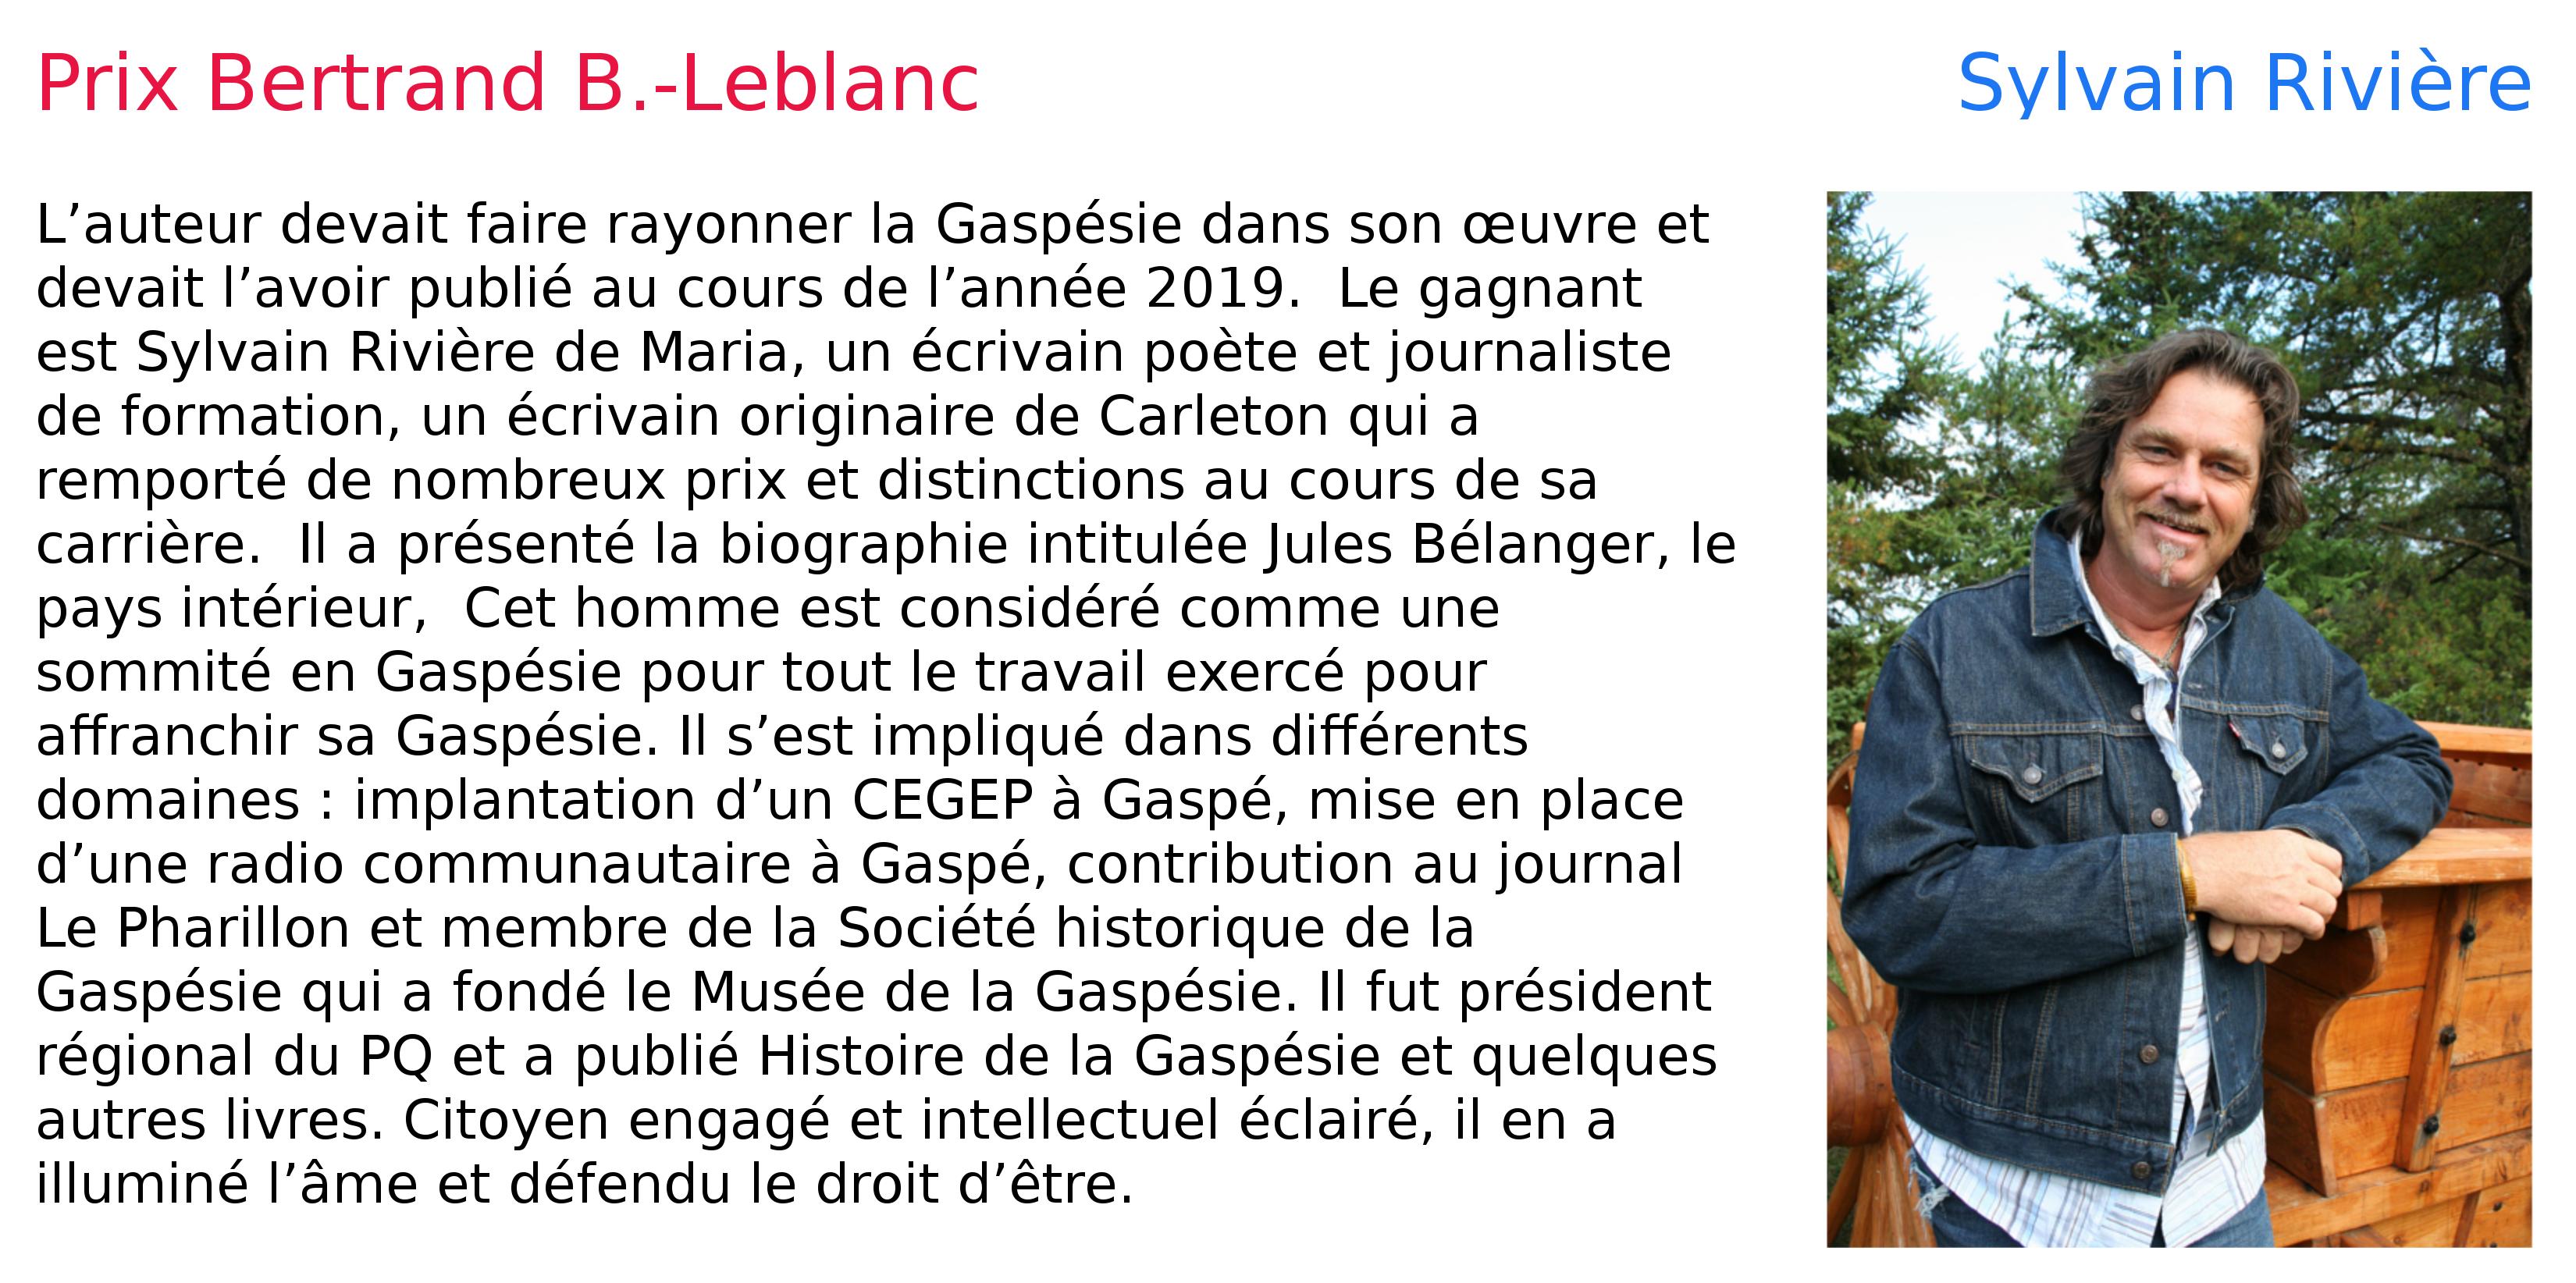 prix Bertrand B.-Leblanc